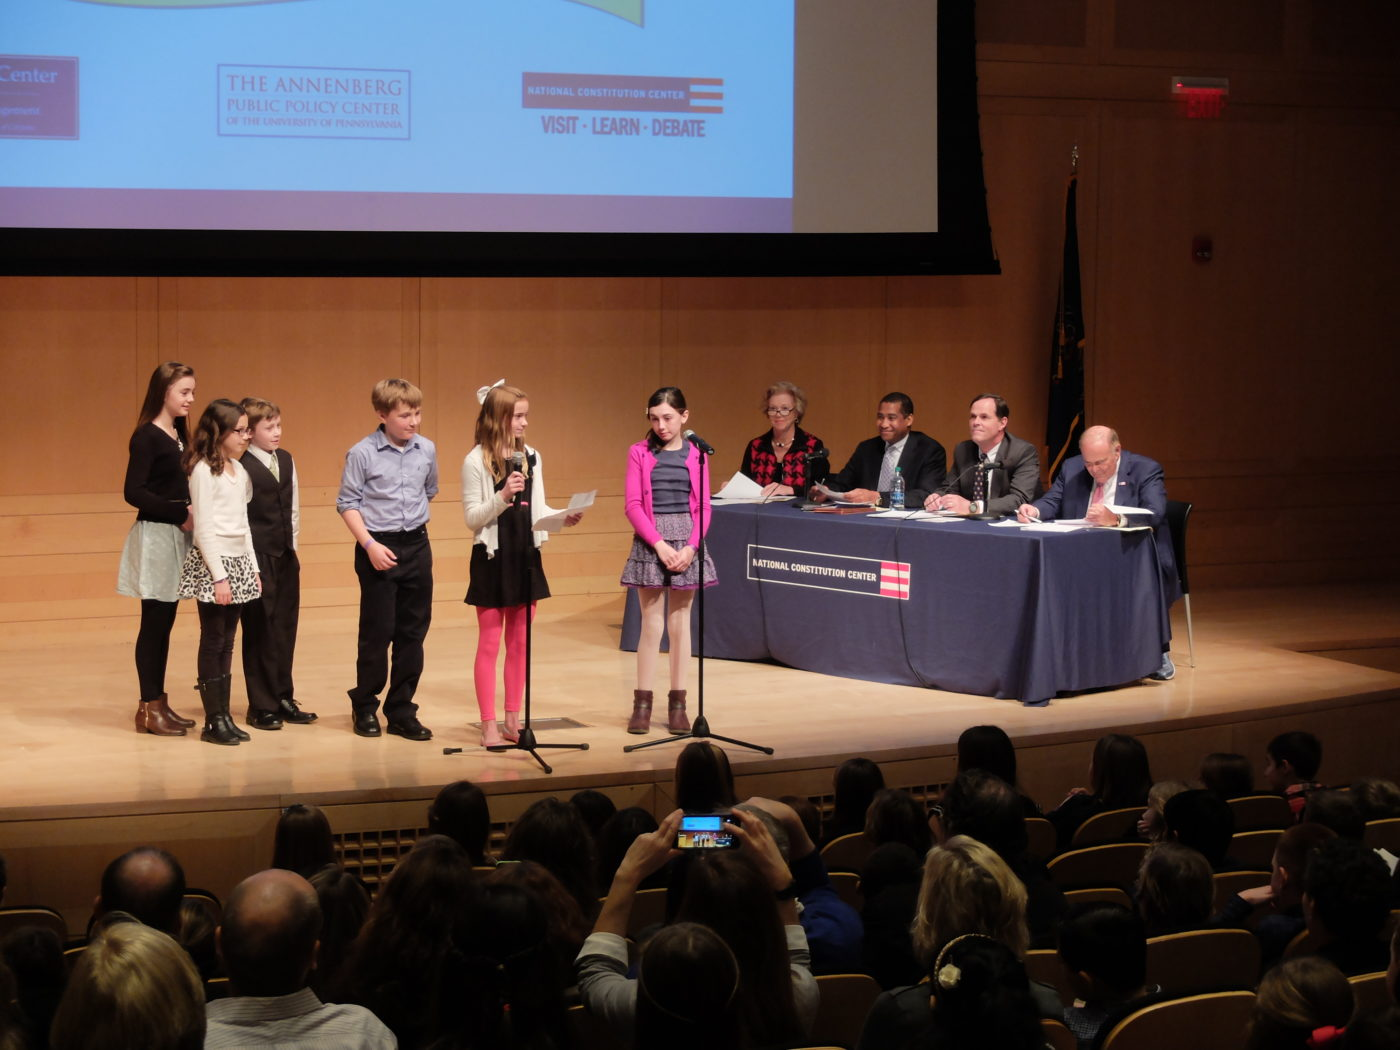 Chestnutwold Elementary's winning presentation.